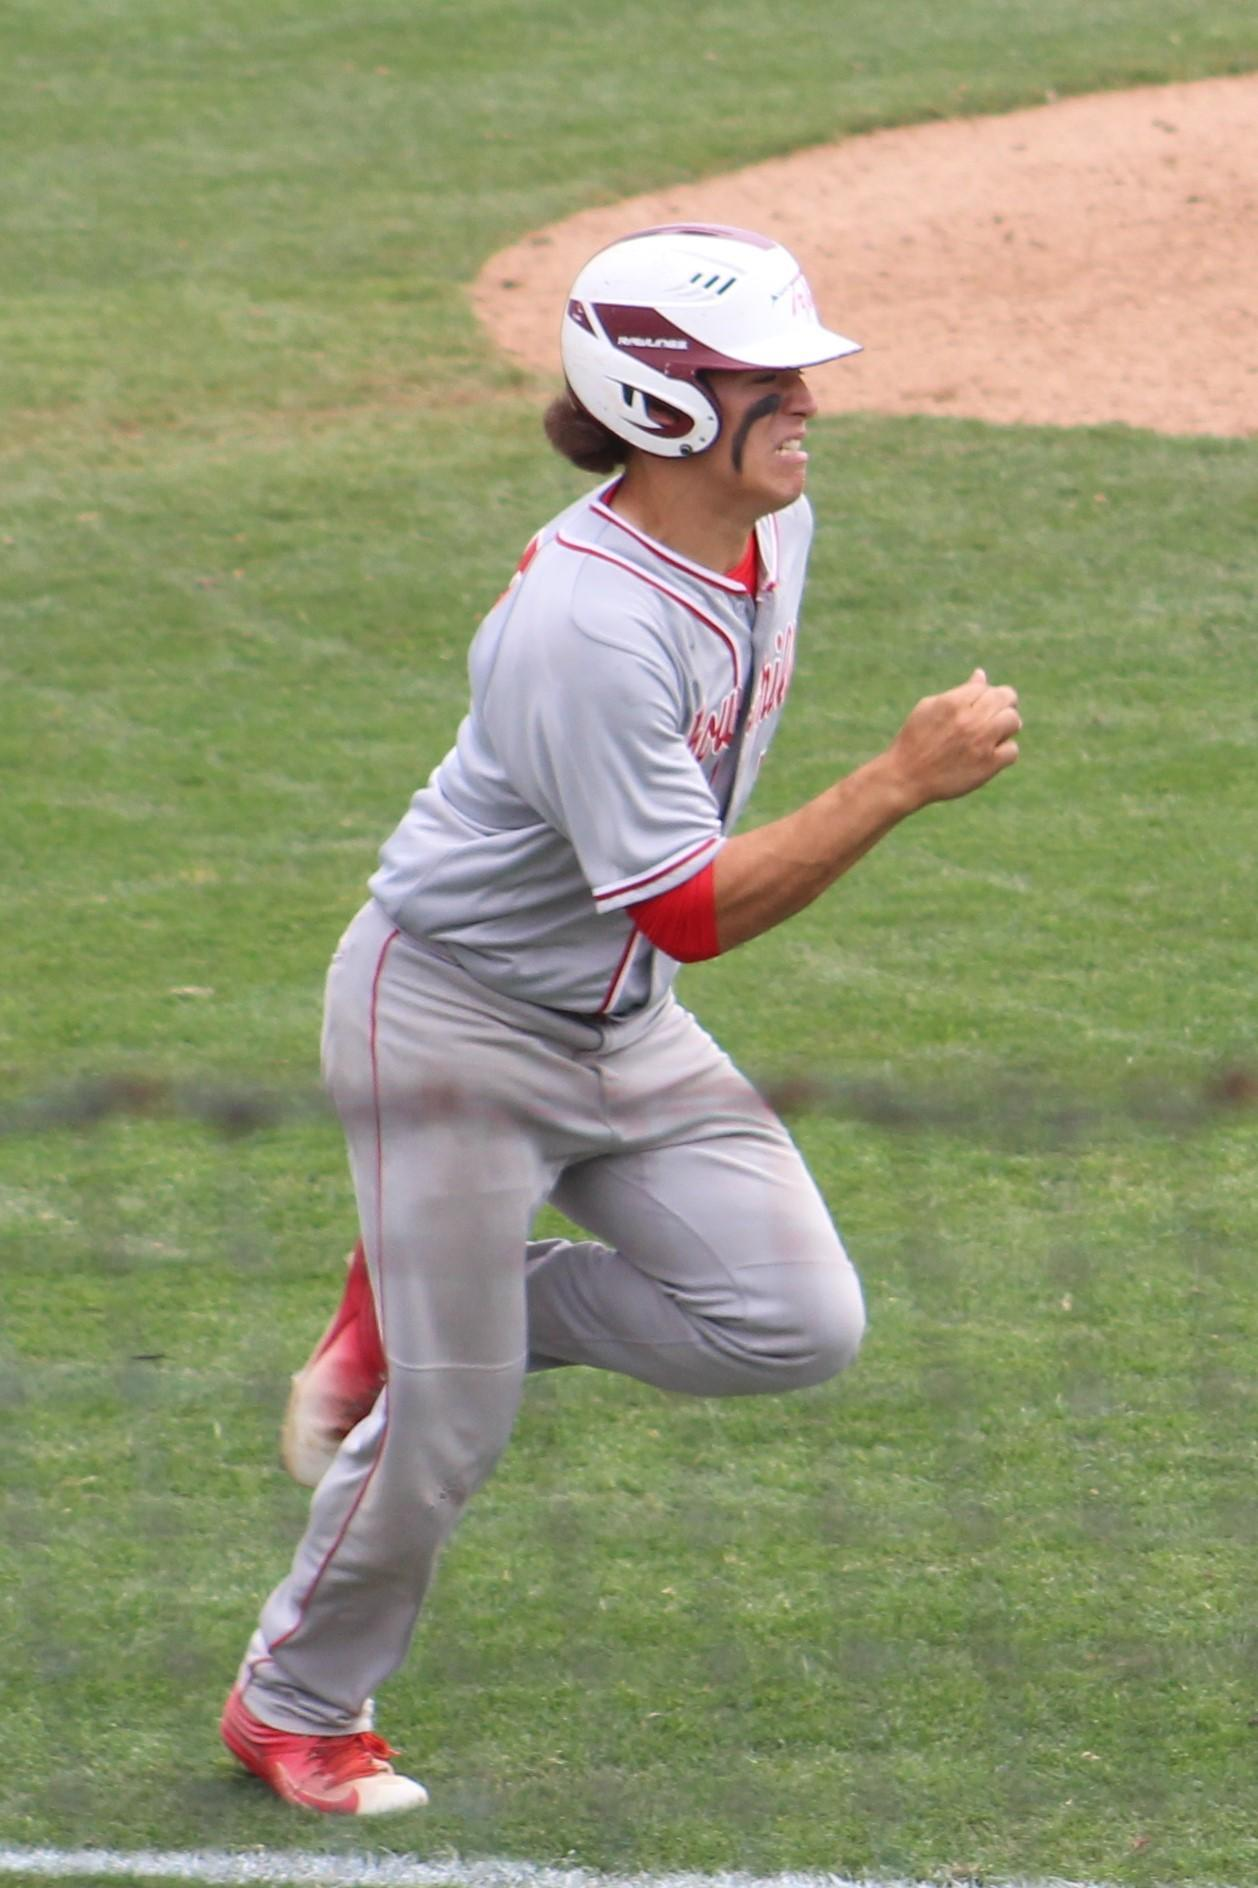 Cody Woolsey bats